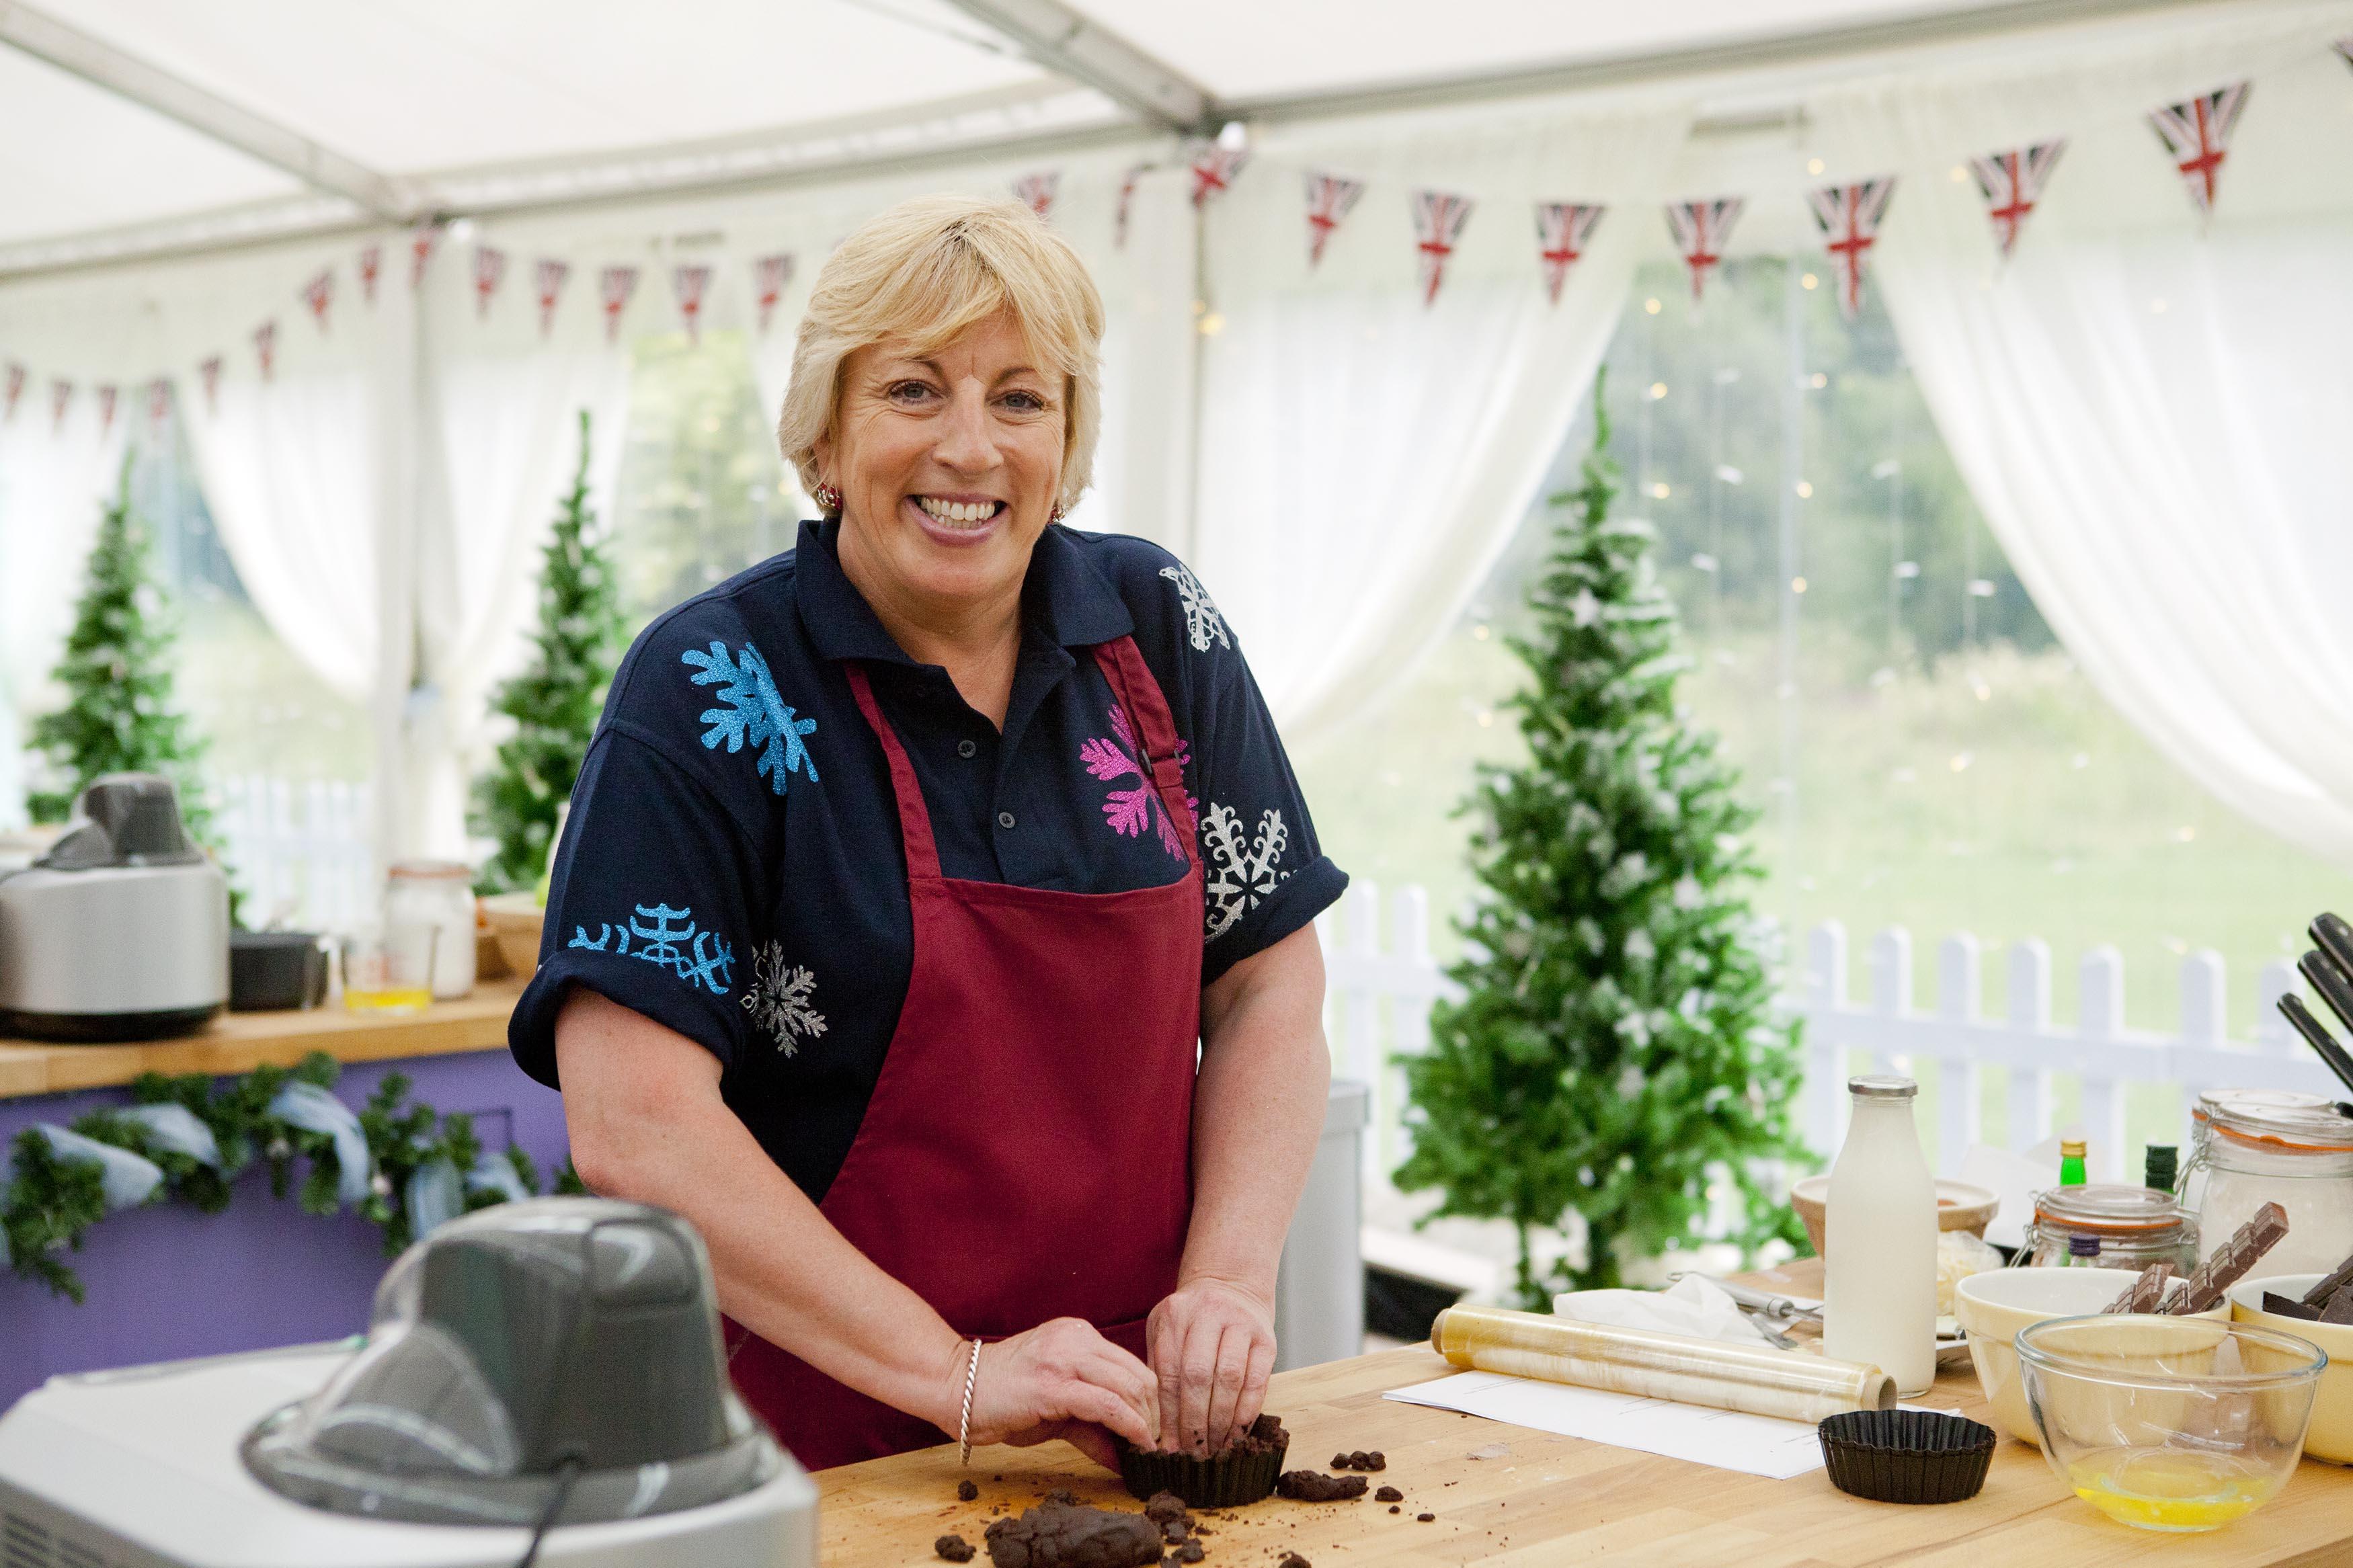 The Great Festive Bake Off: Sandy Docherty (C4, TL)